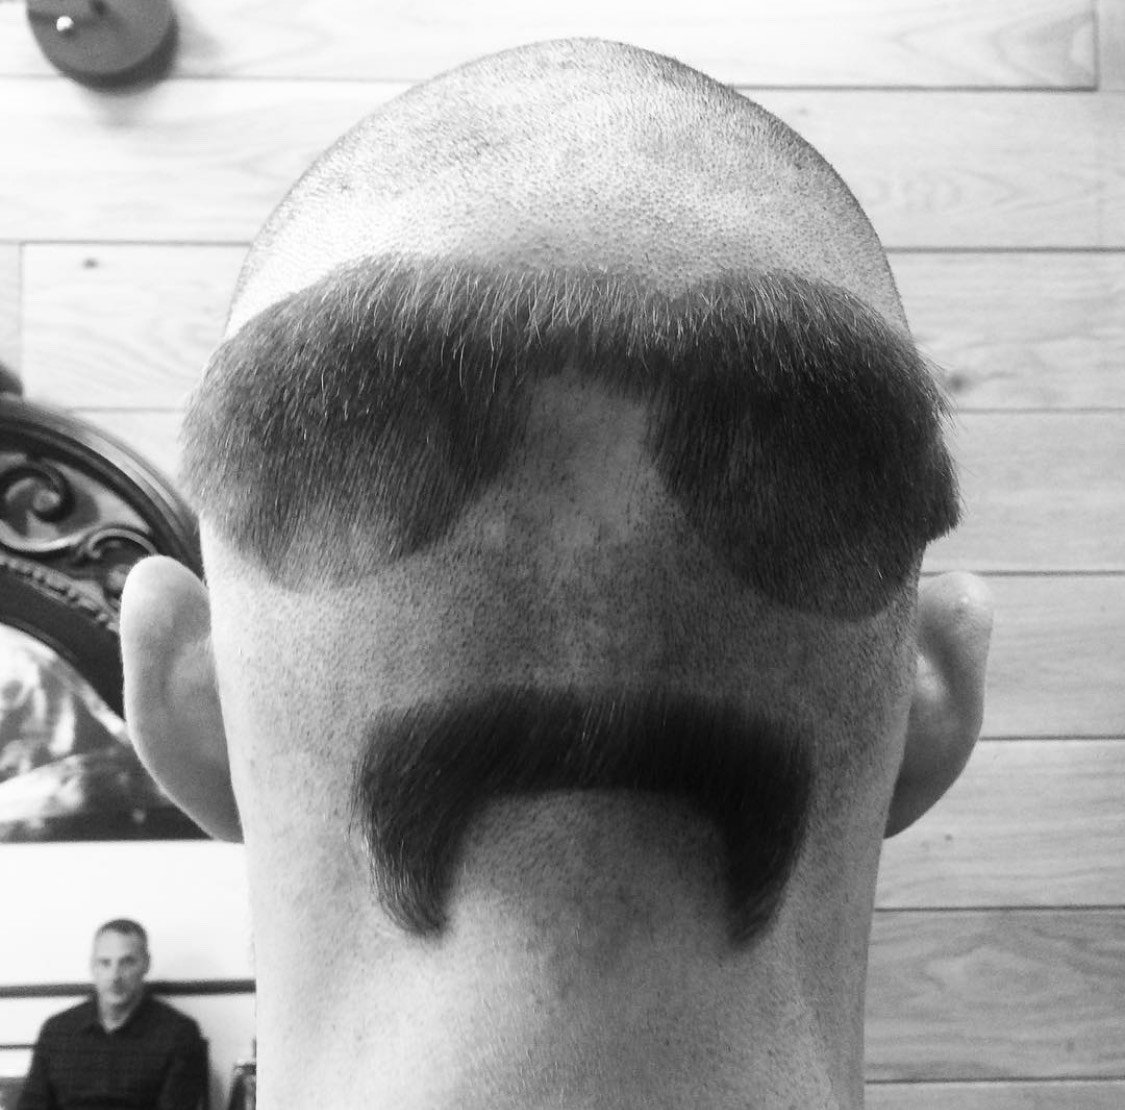 Haircut and Beard Trim